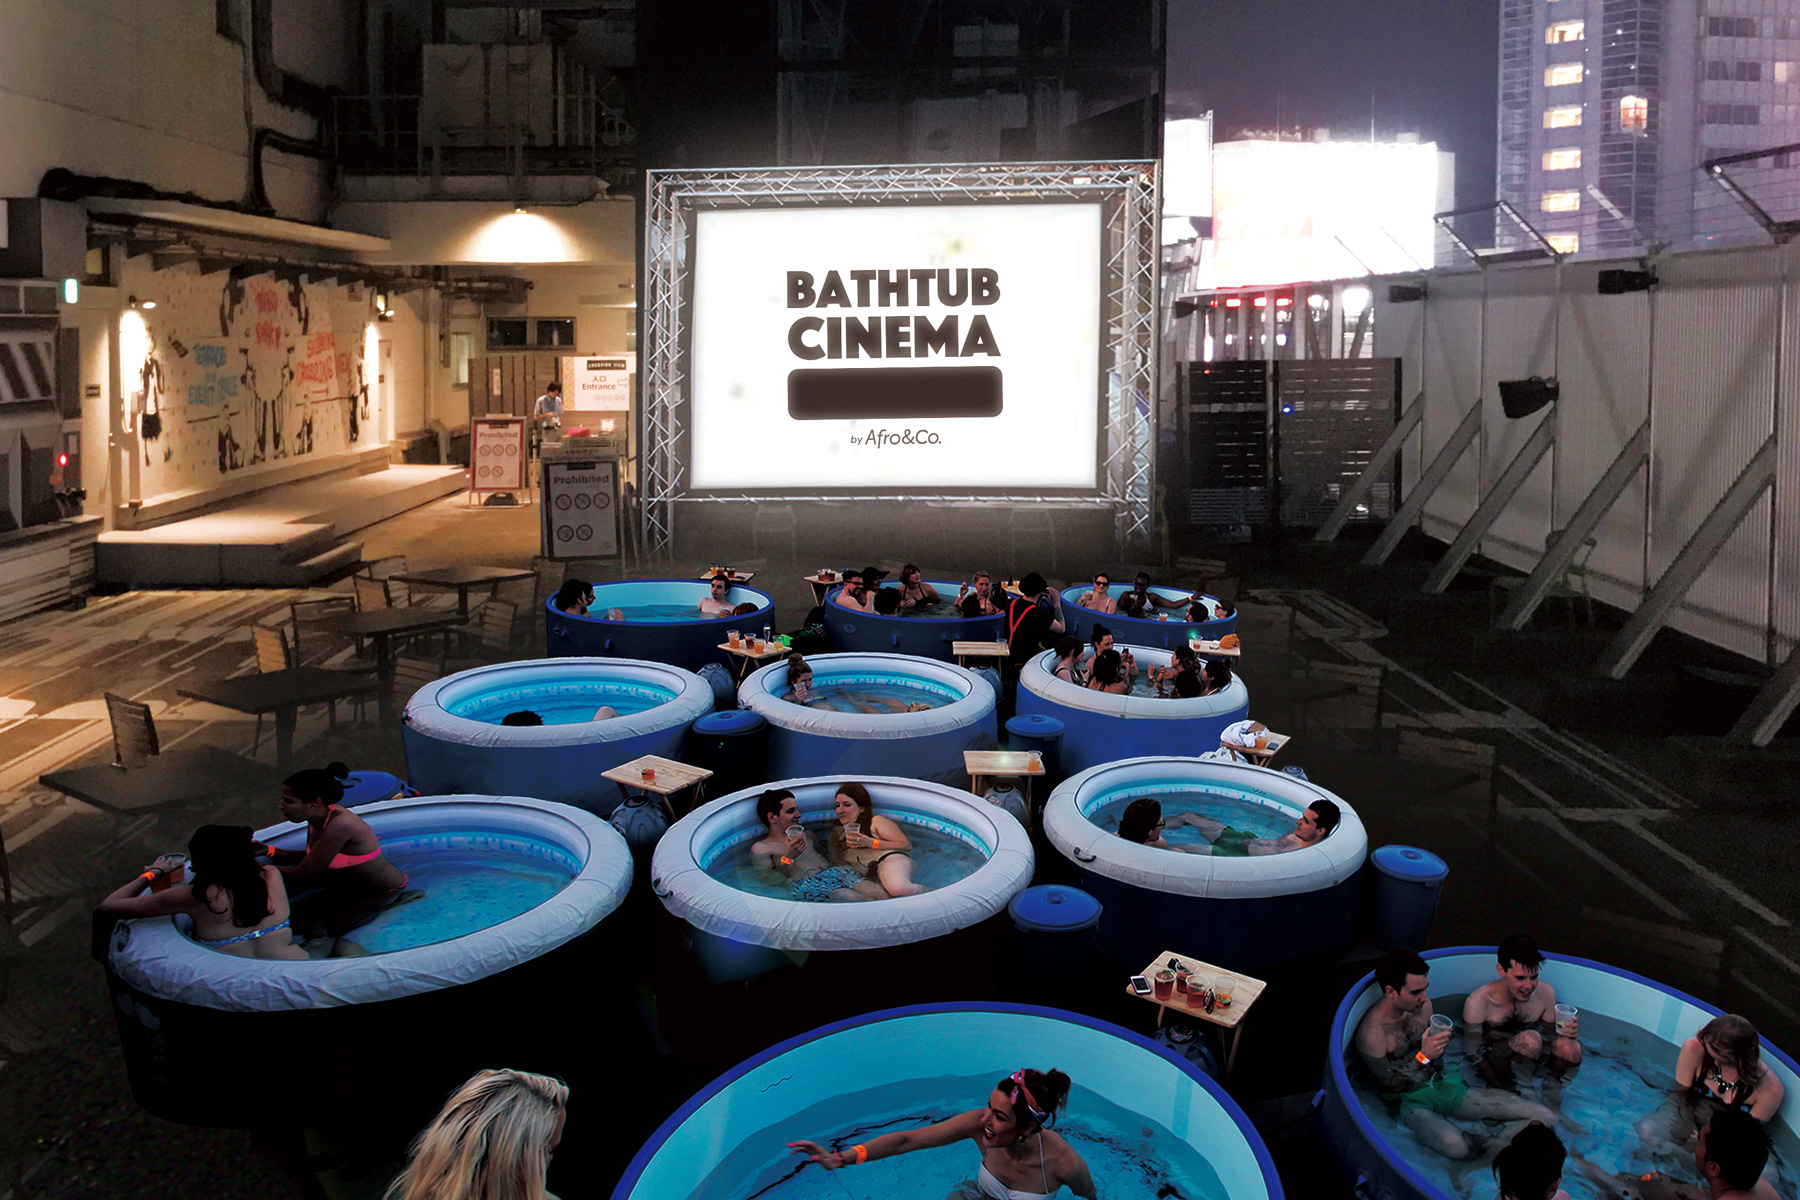 BATHTUB CINEMA